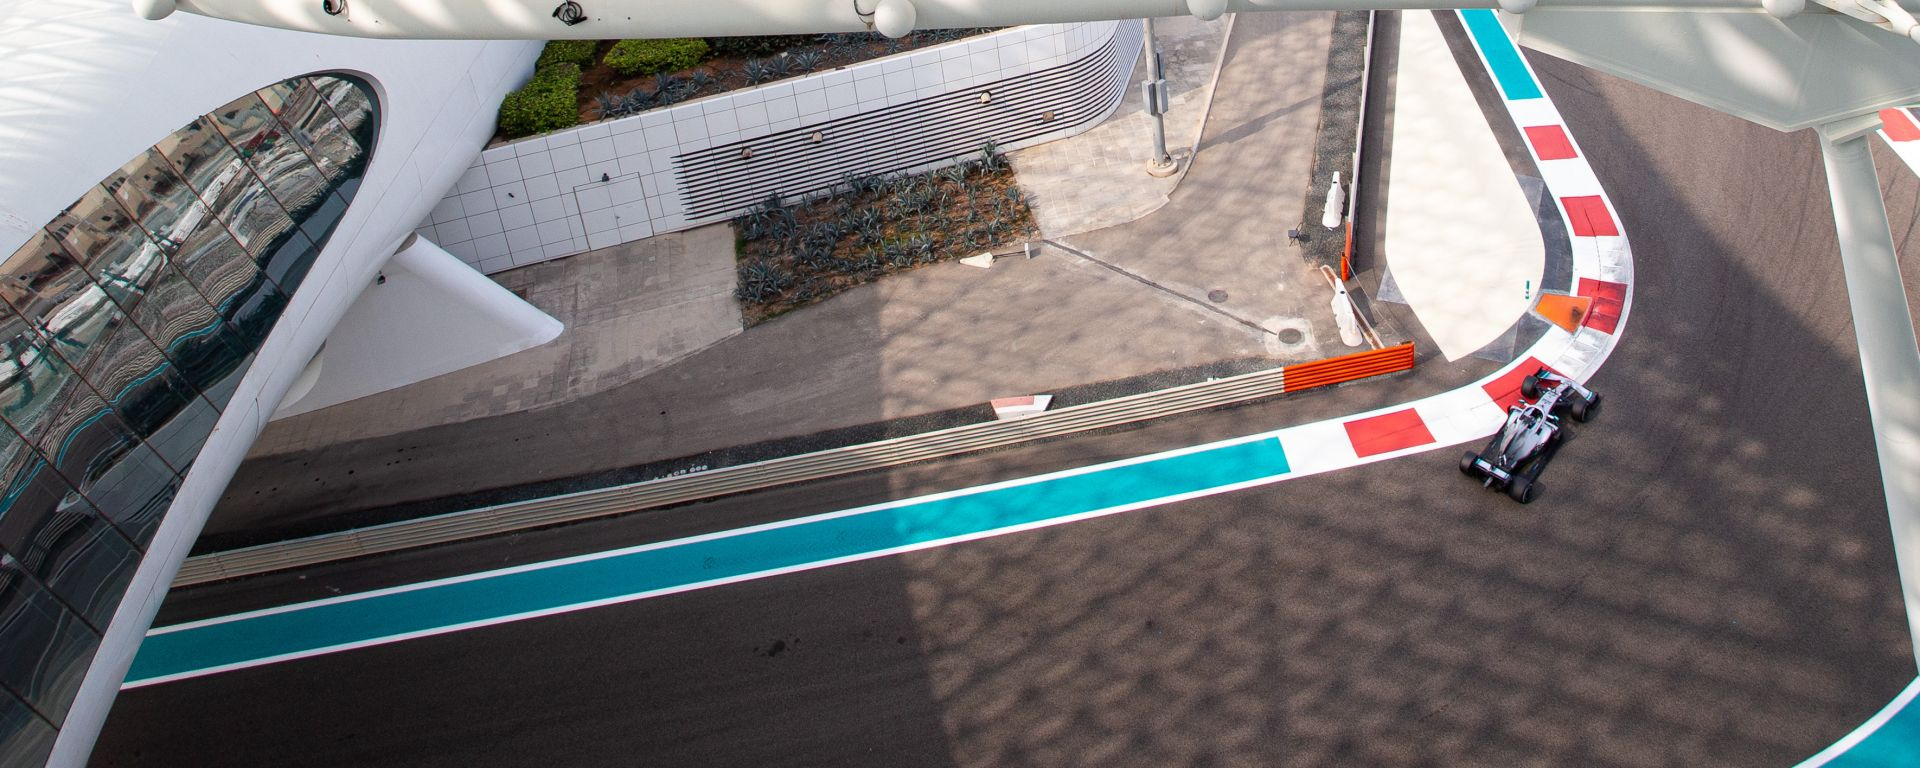 F1 Test Pirelli Abu Dhabi 2019, Yas Marina: Valtteri Bottas (Mercedes)